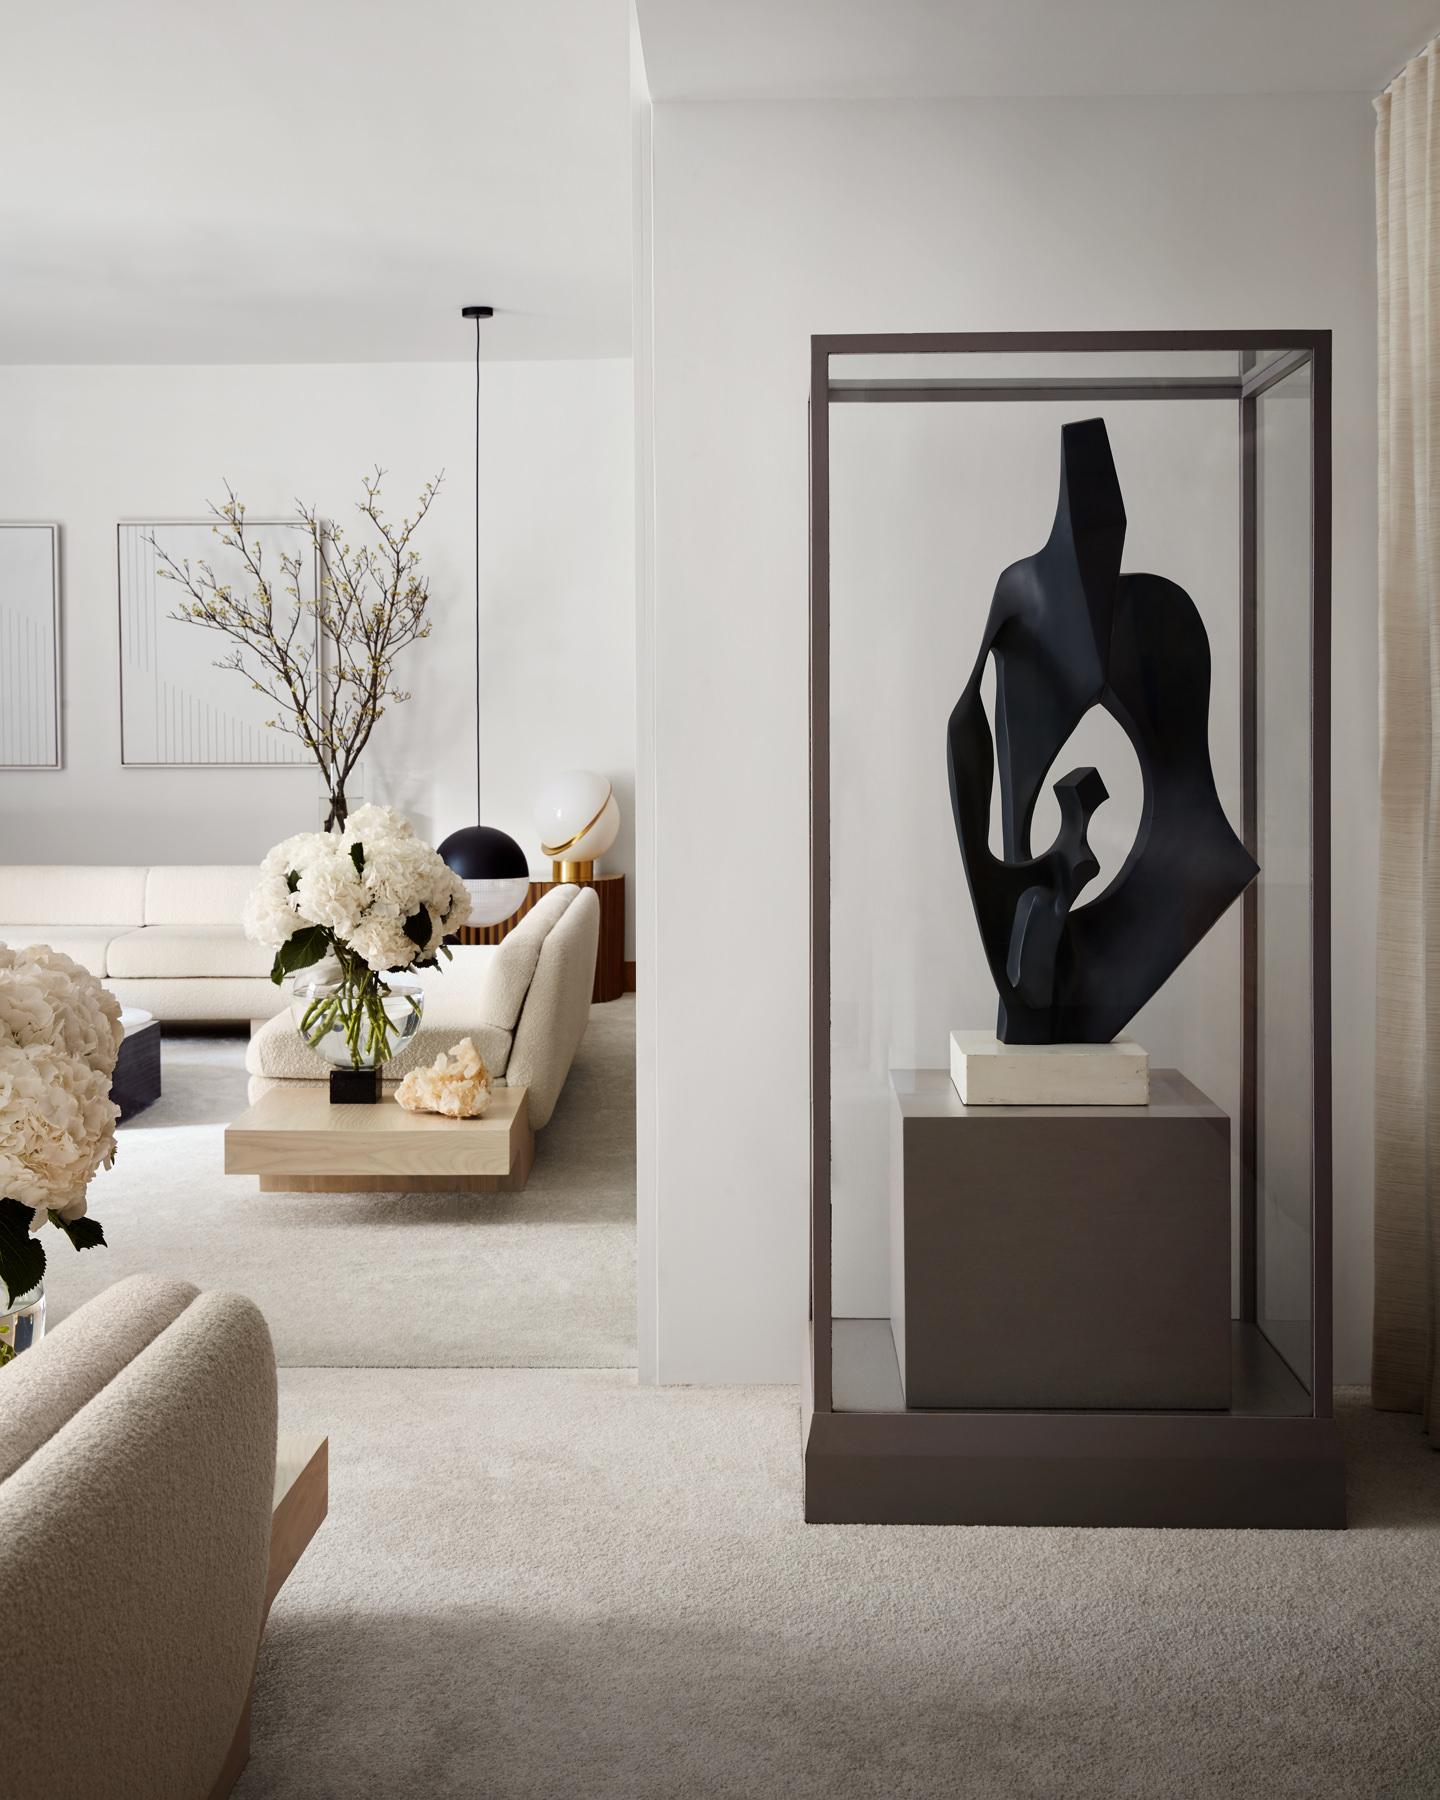 Lee Broom Penthouse New York Living Room Photo Stephen Kent Johnson Yellowtrace 02